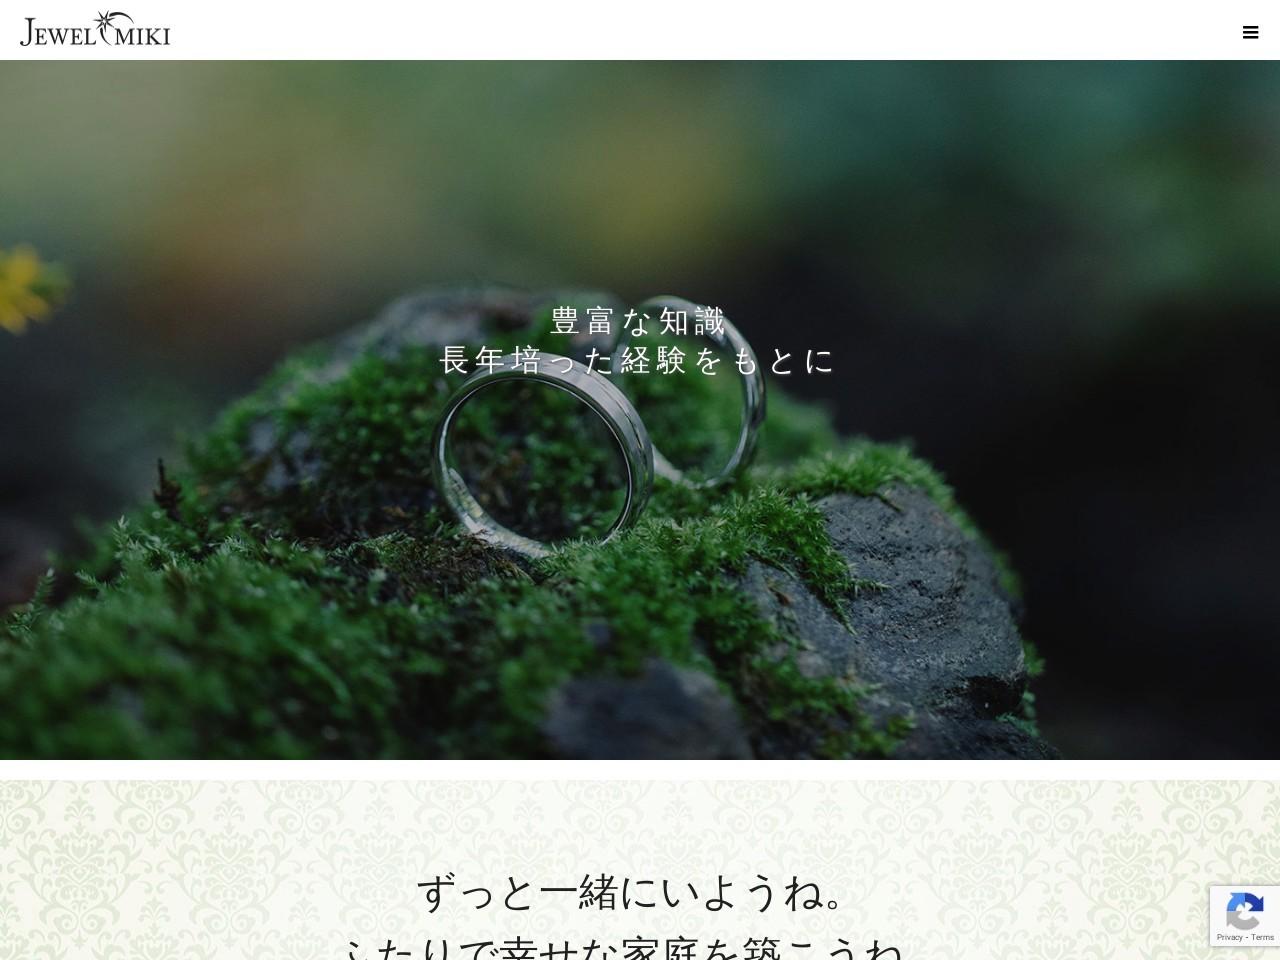 JewelMIKI(ジュエルミキ)大分店|鍛造結婚指輪(マリッジリング)、ダイヤモンド婚約指輪(エンゲージリング)、リフォーム、修理、買取のジュエリー専門店 | 鍛造結婚指輪(マリッジリング)、ダイヤモンド婚約指輪(エンゲージリング)、リフォーム、修理、買取のジュエリー専門店